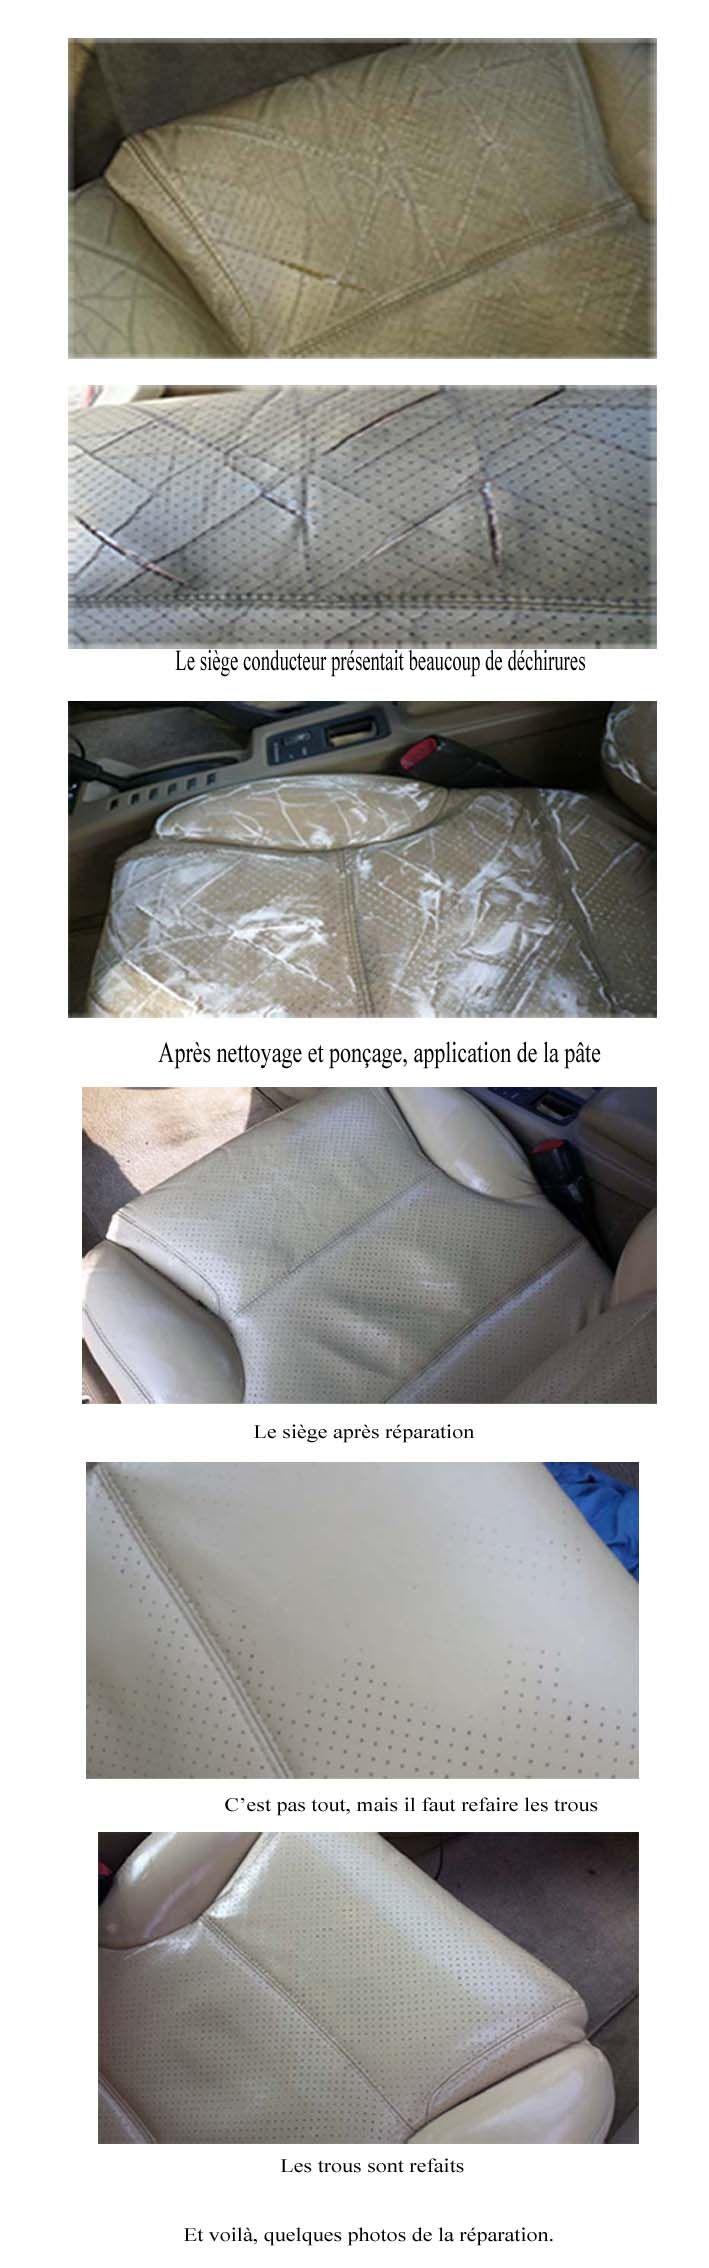 lar paration a t faite sofolk. Black Bedroom Furniture Sets. Home Design Ideas